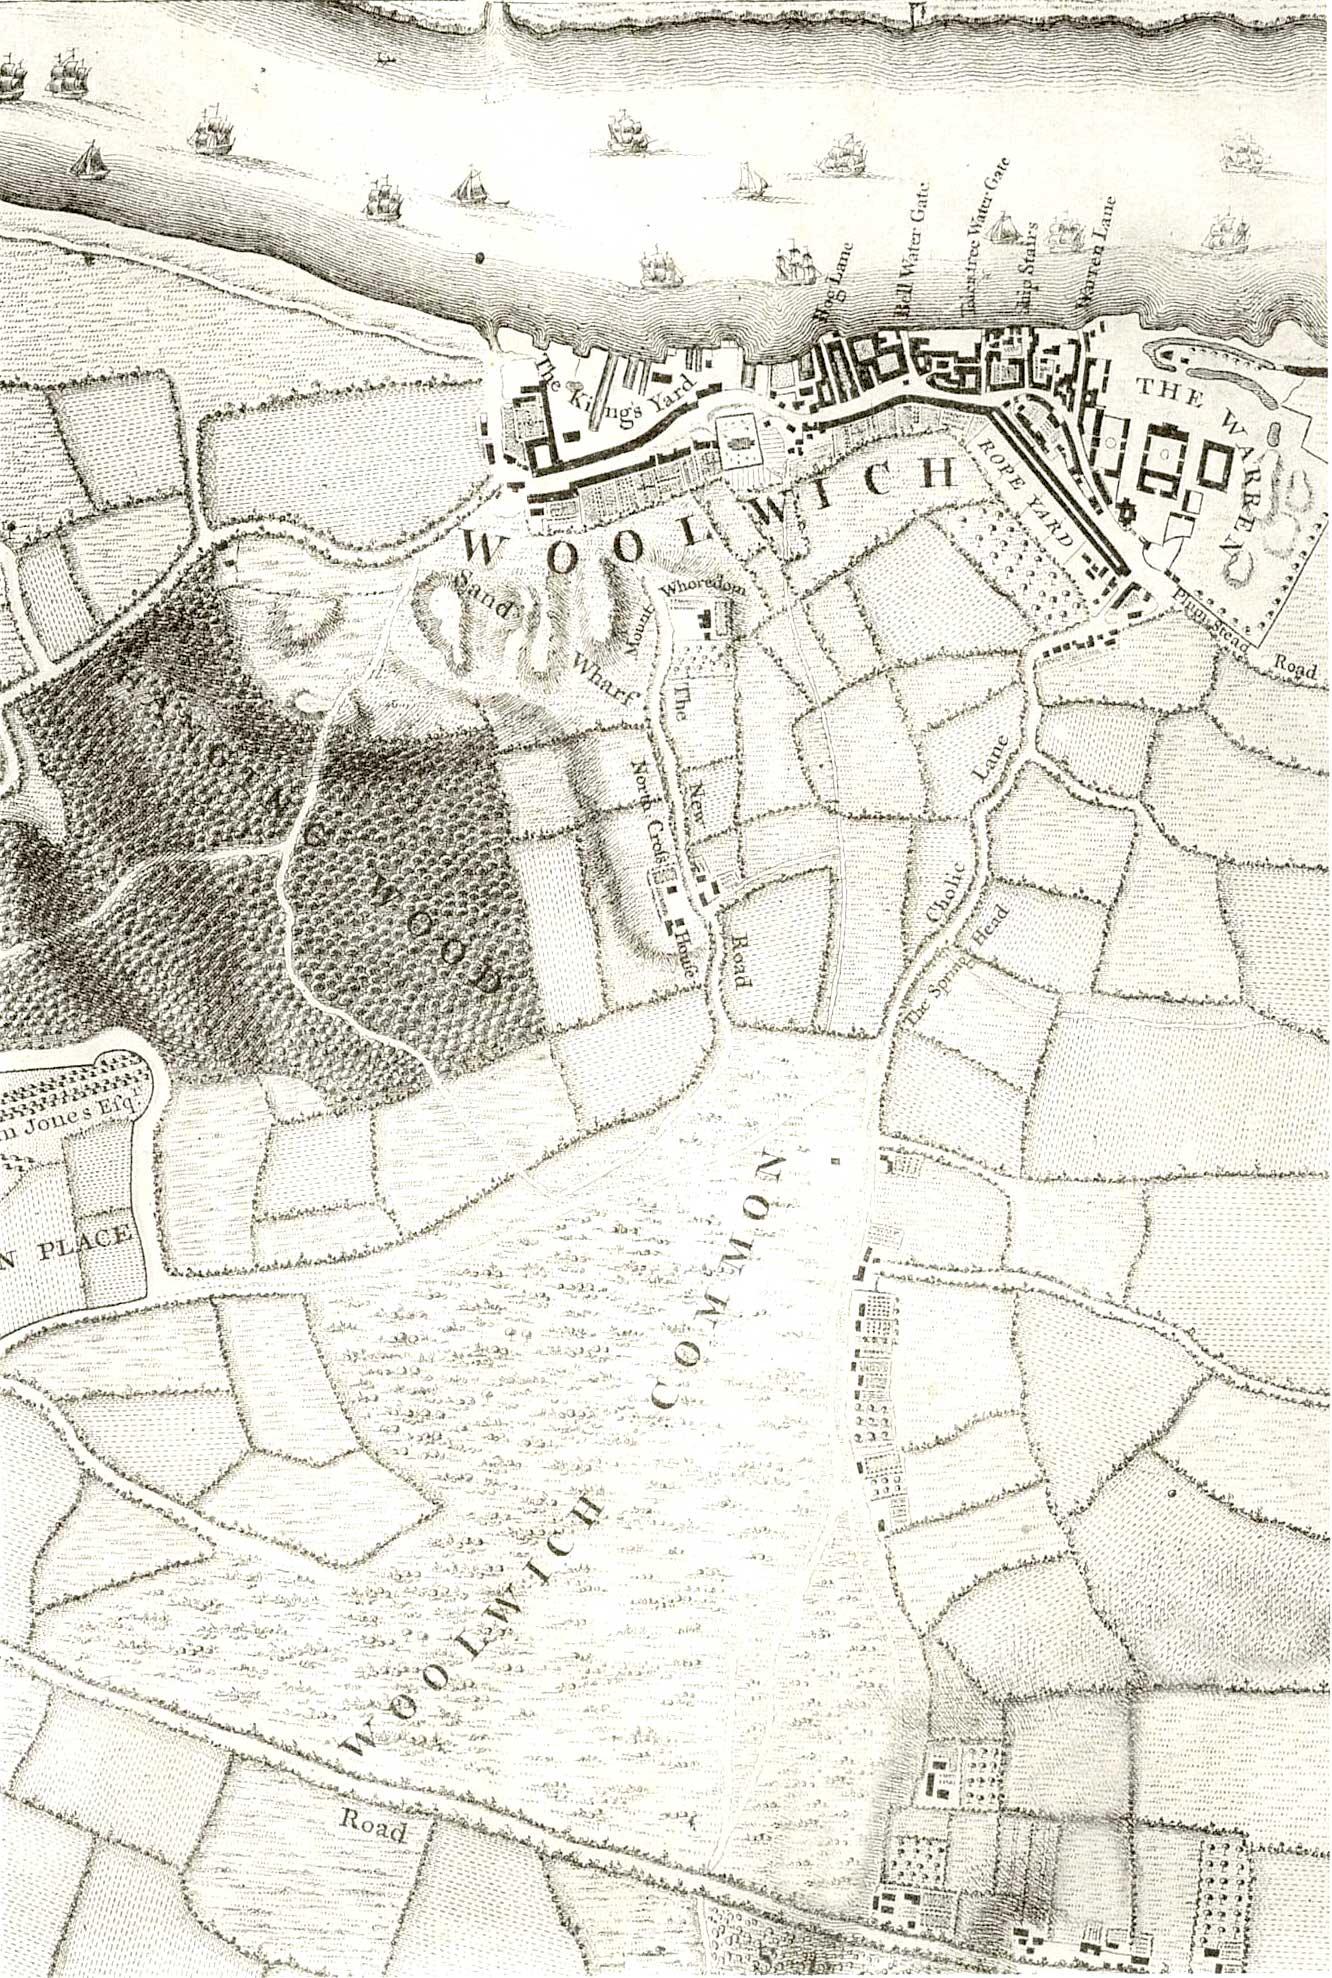 File:Map of Woolwich, 1746.jpg - Wikipedia